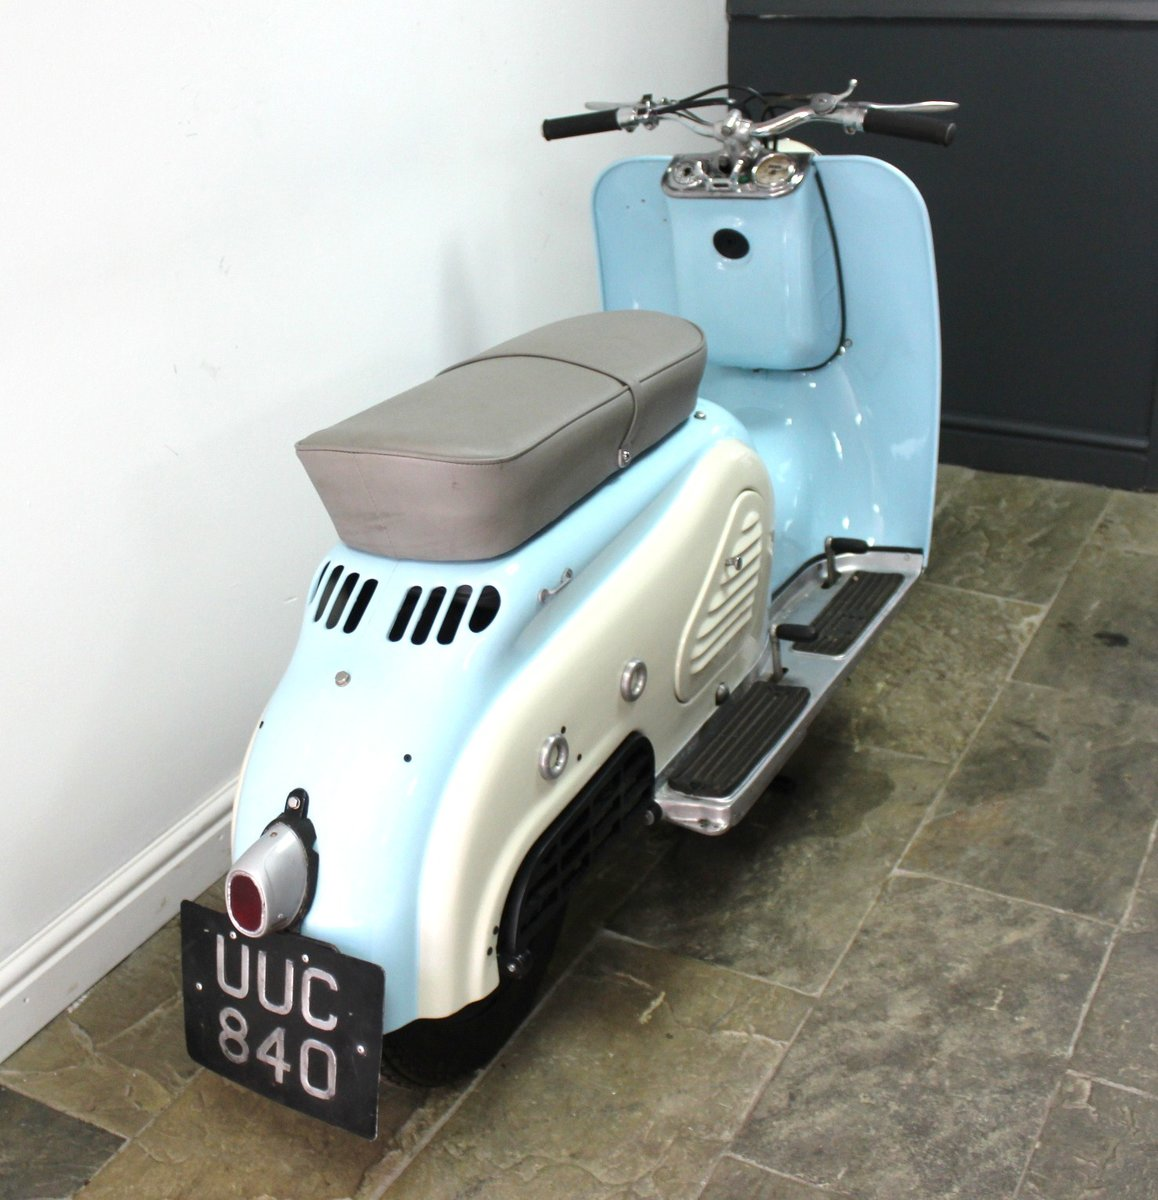 1957 Zundapp Bella R151 150 cc  Four Stroke Scooter For Sale (picture 2 of 6)